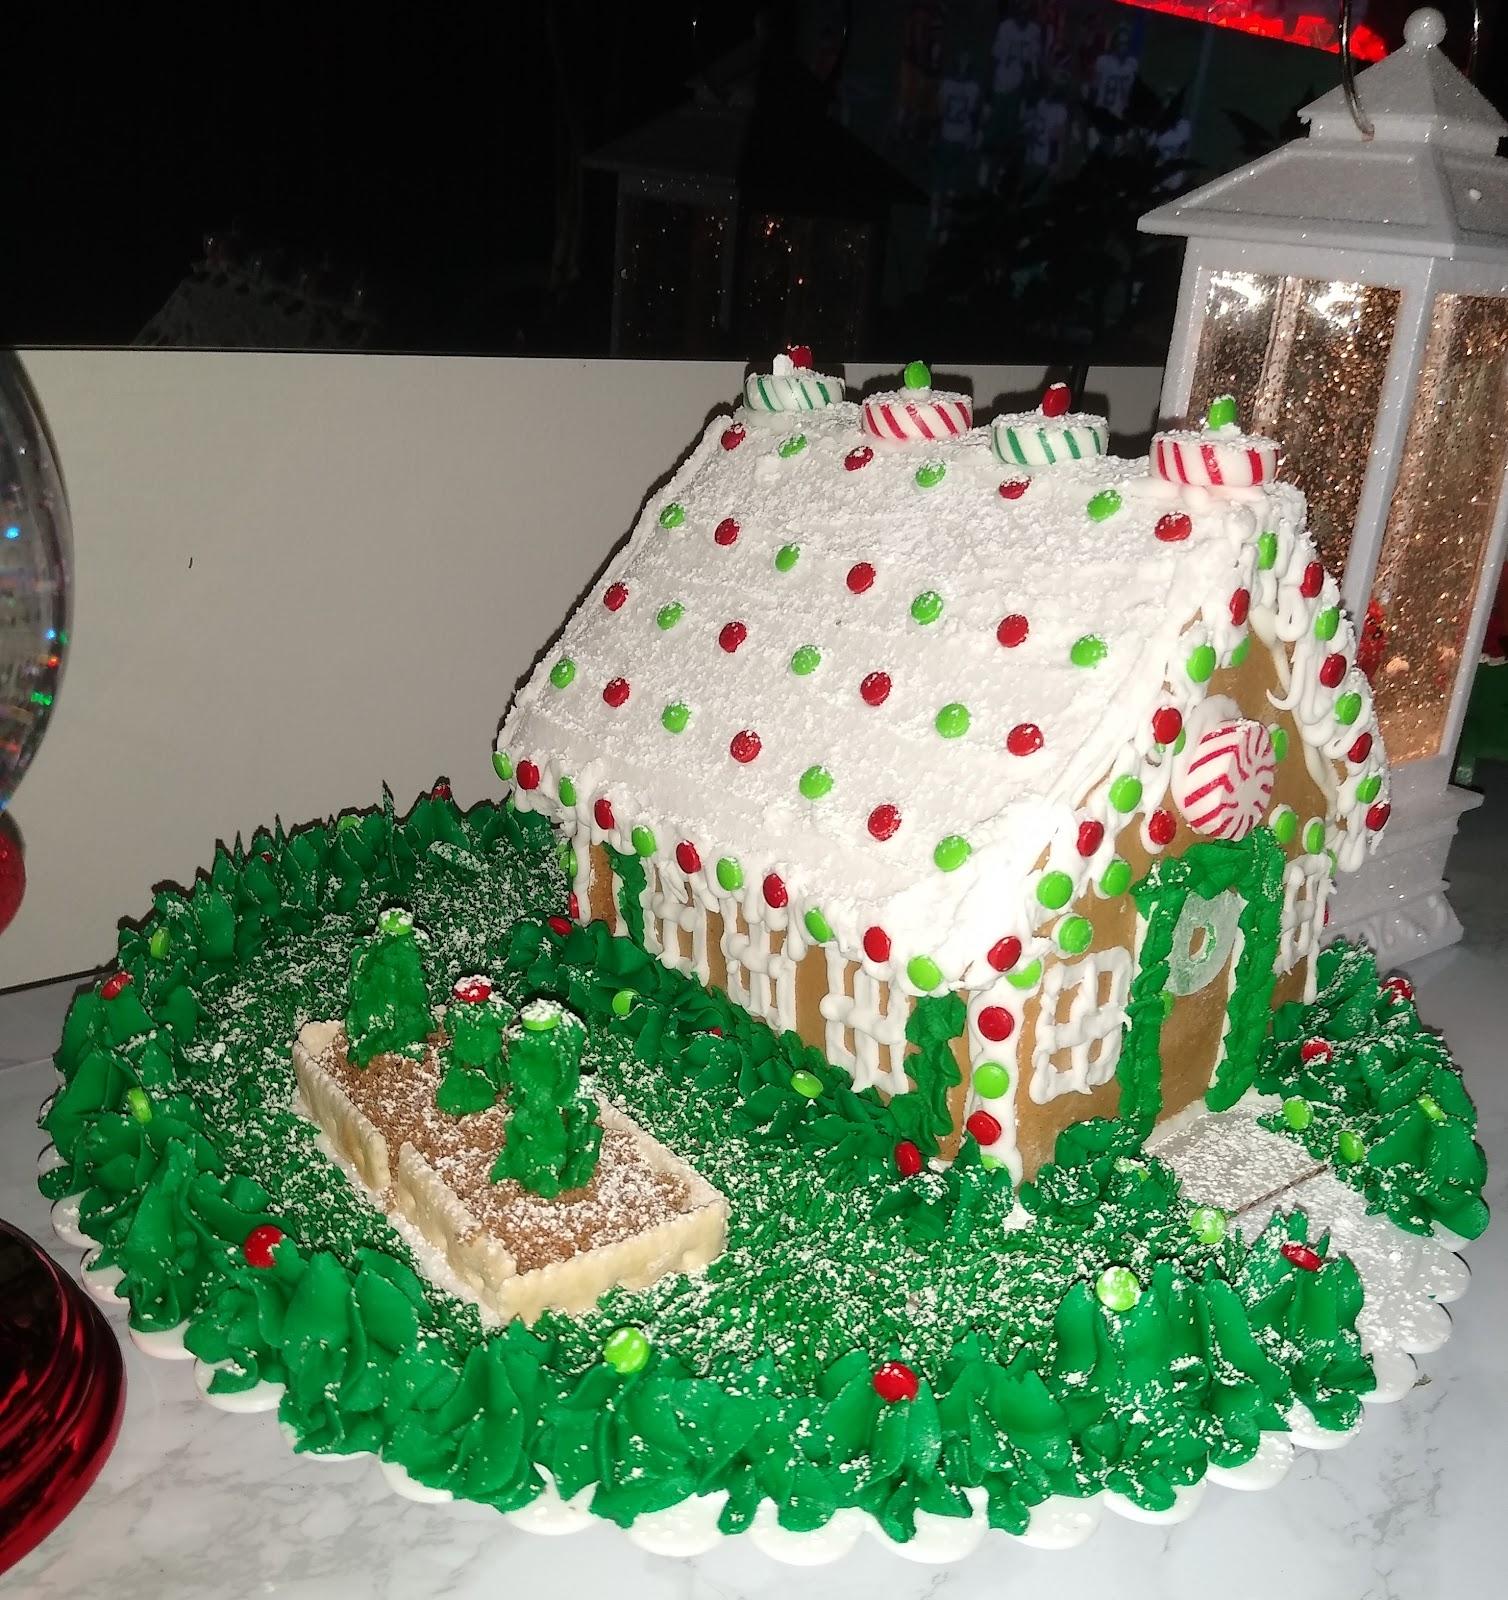 gingerbread house with a buttercream garden